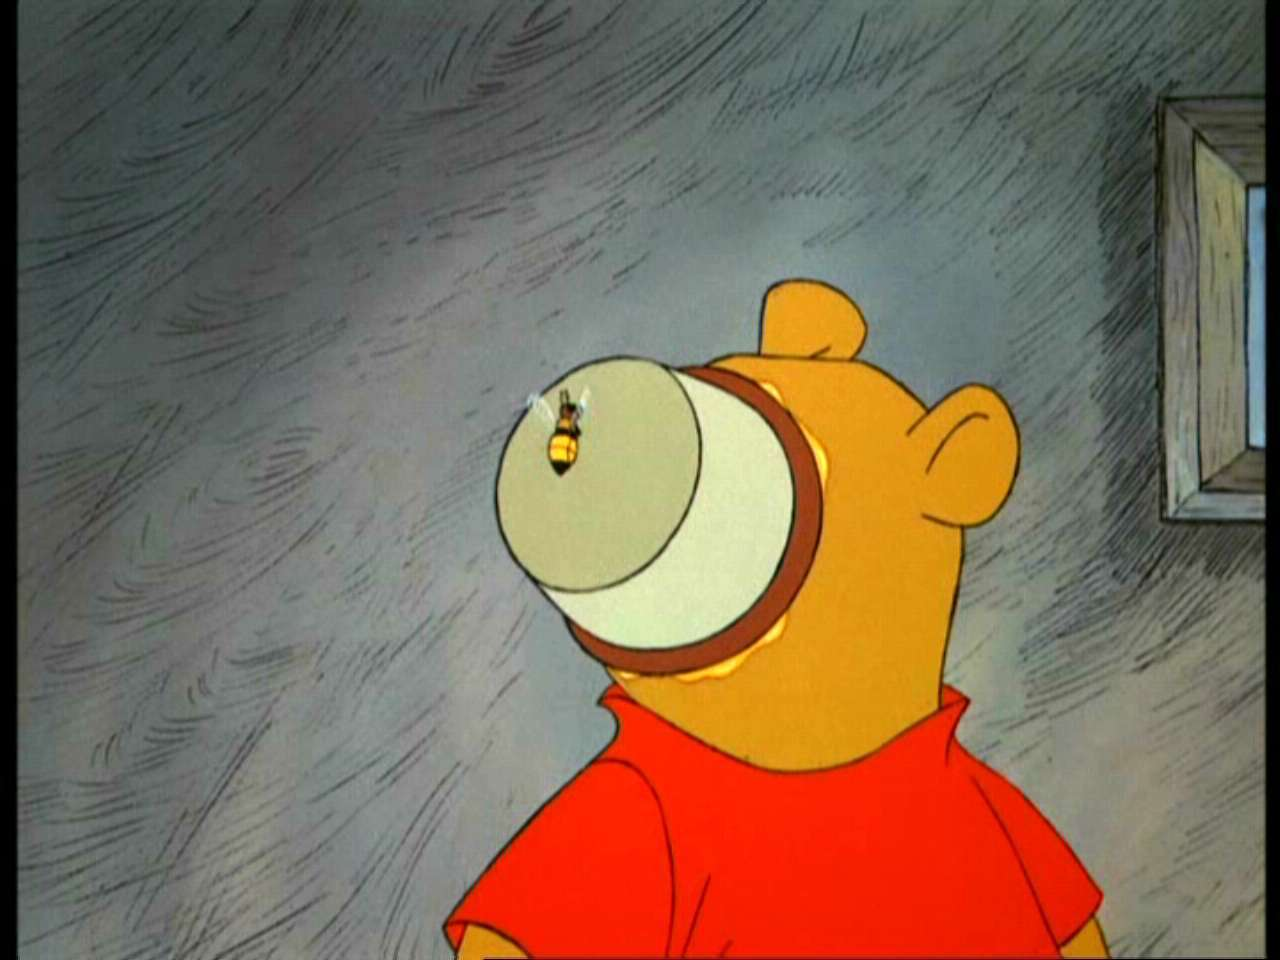 Winnie the Pooh Winnie the Pooh and the Hunny Tree